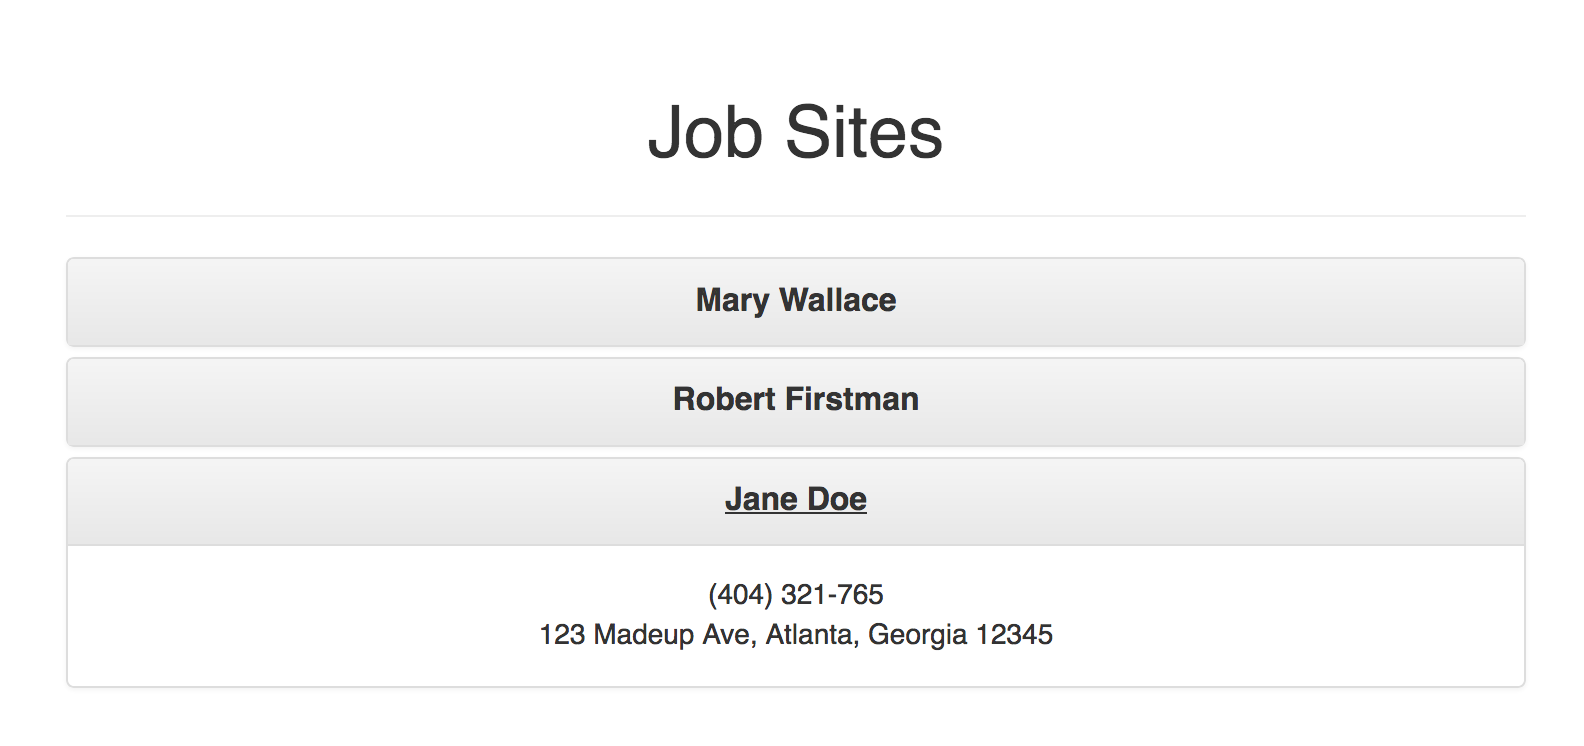 Job Site Page